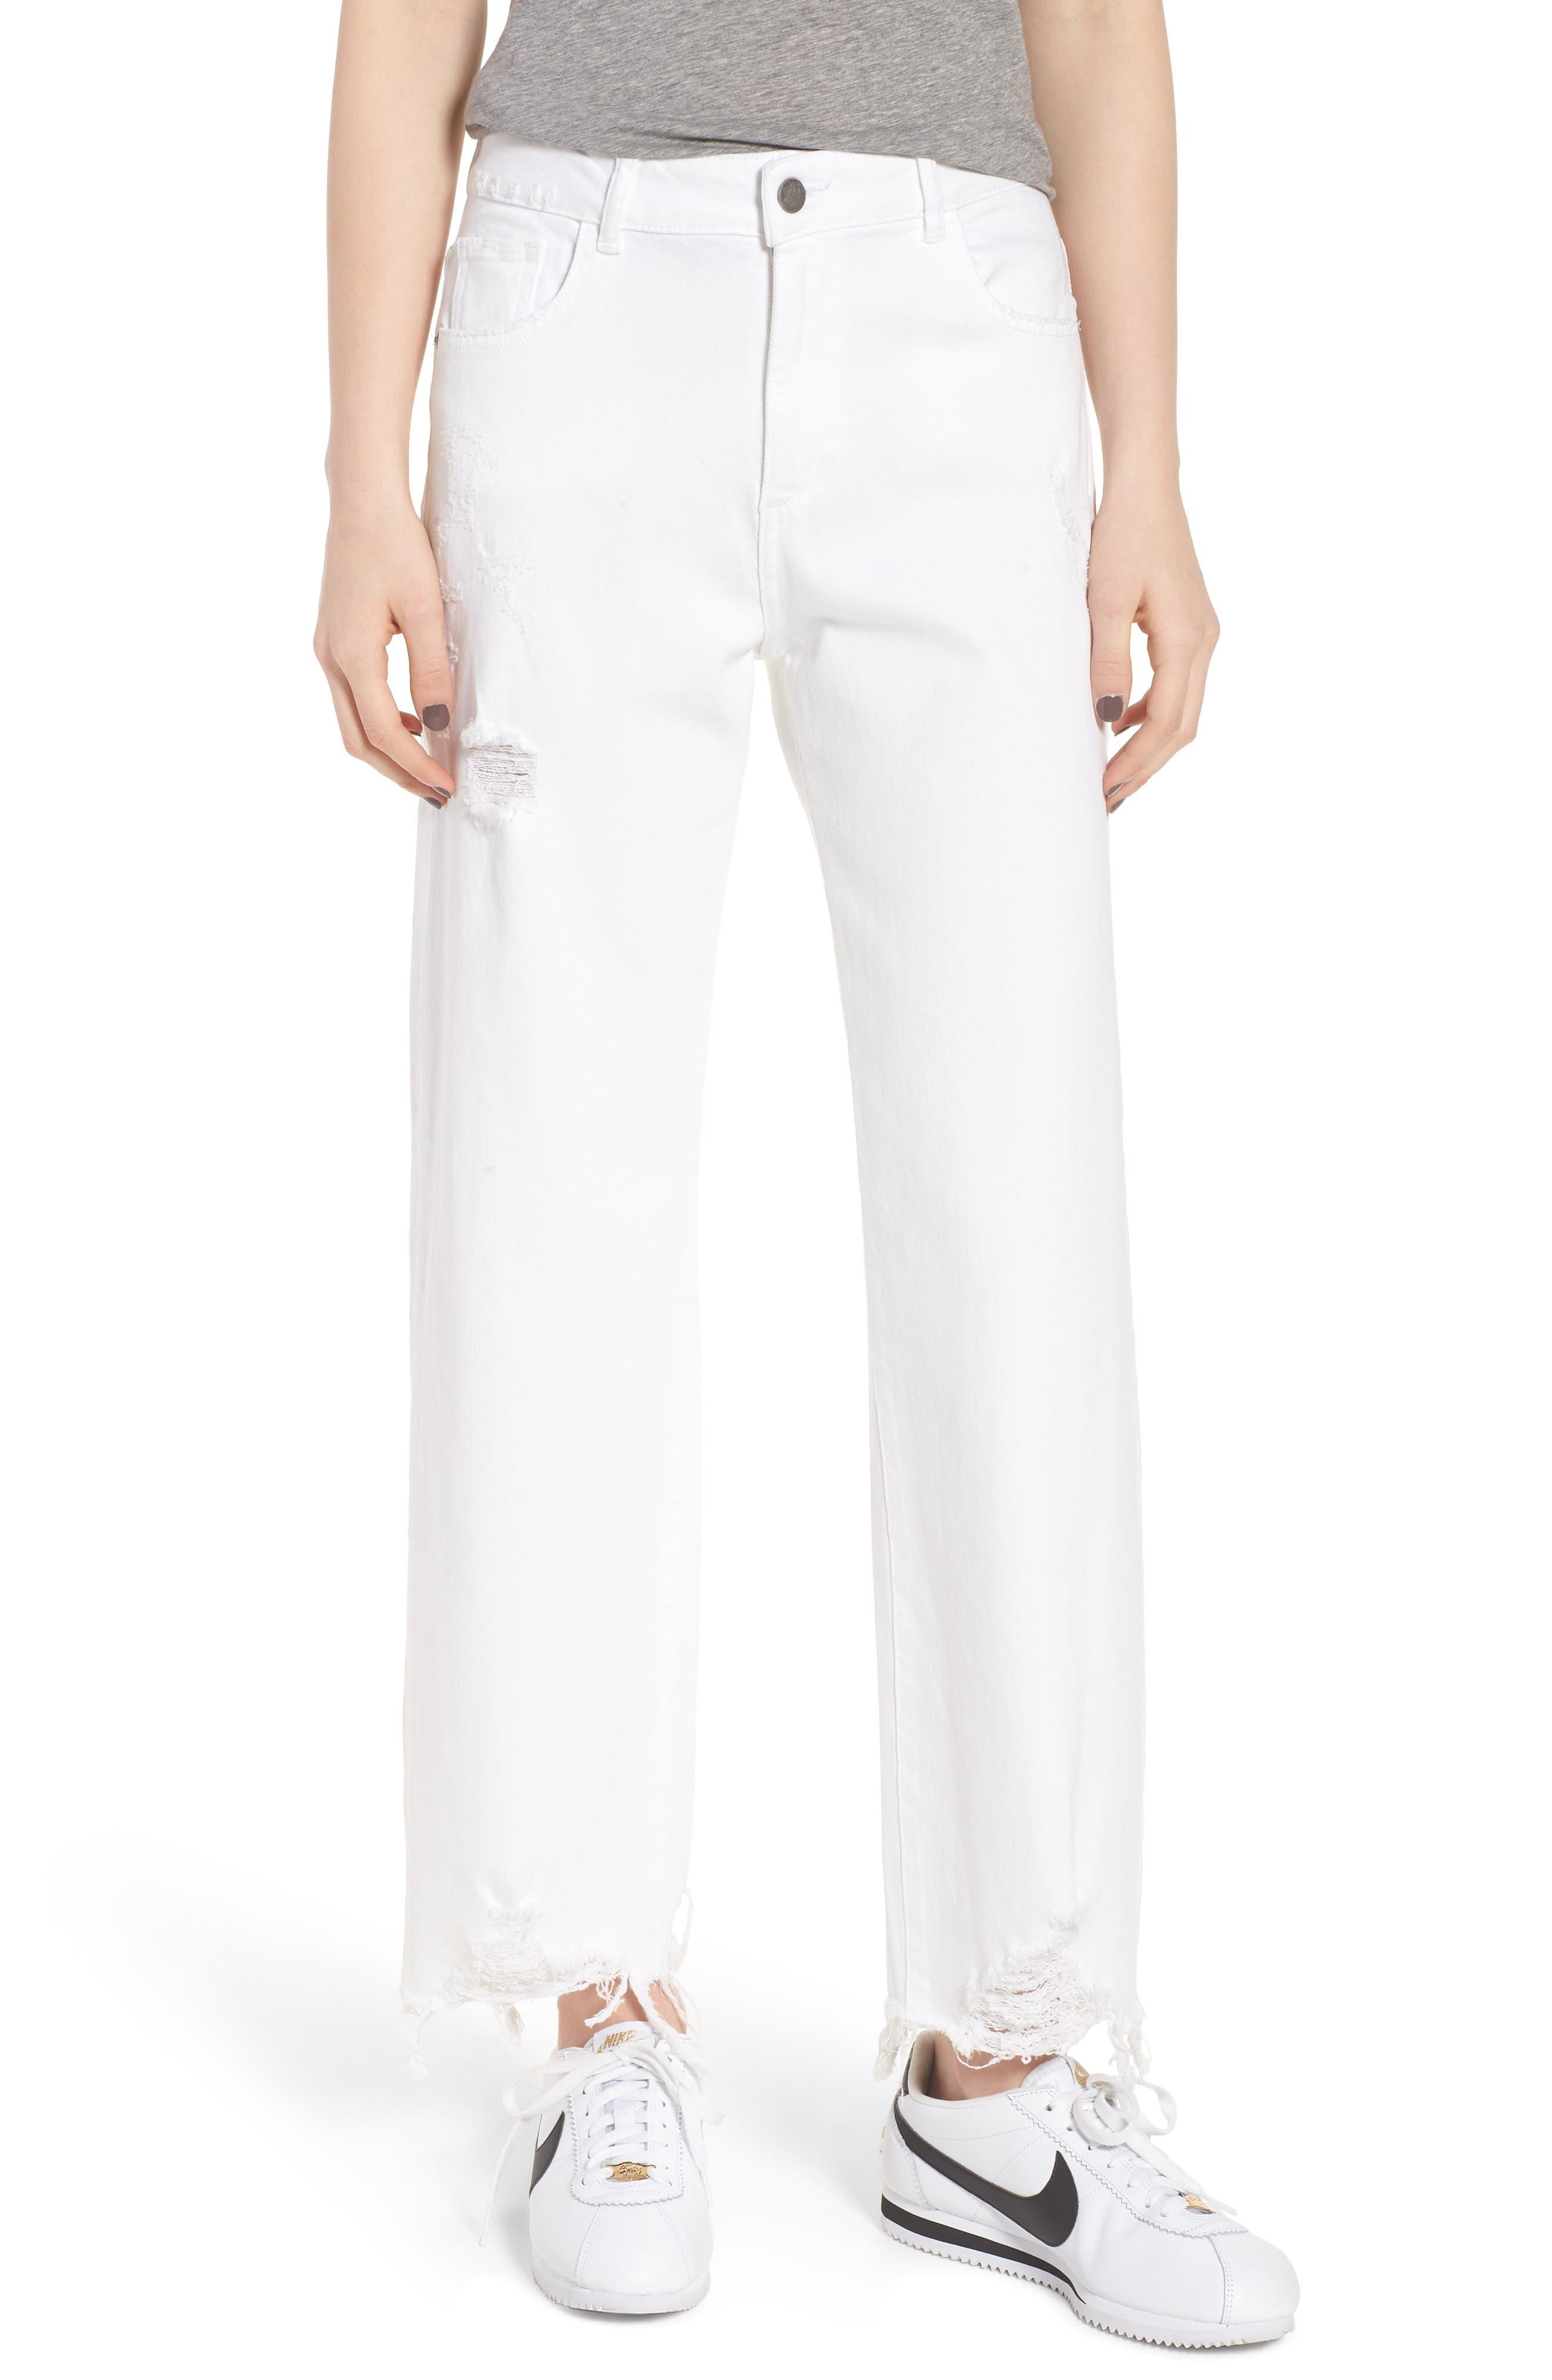 Hepburn High Waist Wide Leg Jeans,                             Main thumbnail 1, color,                             100